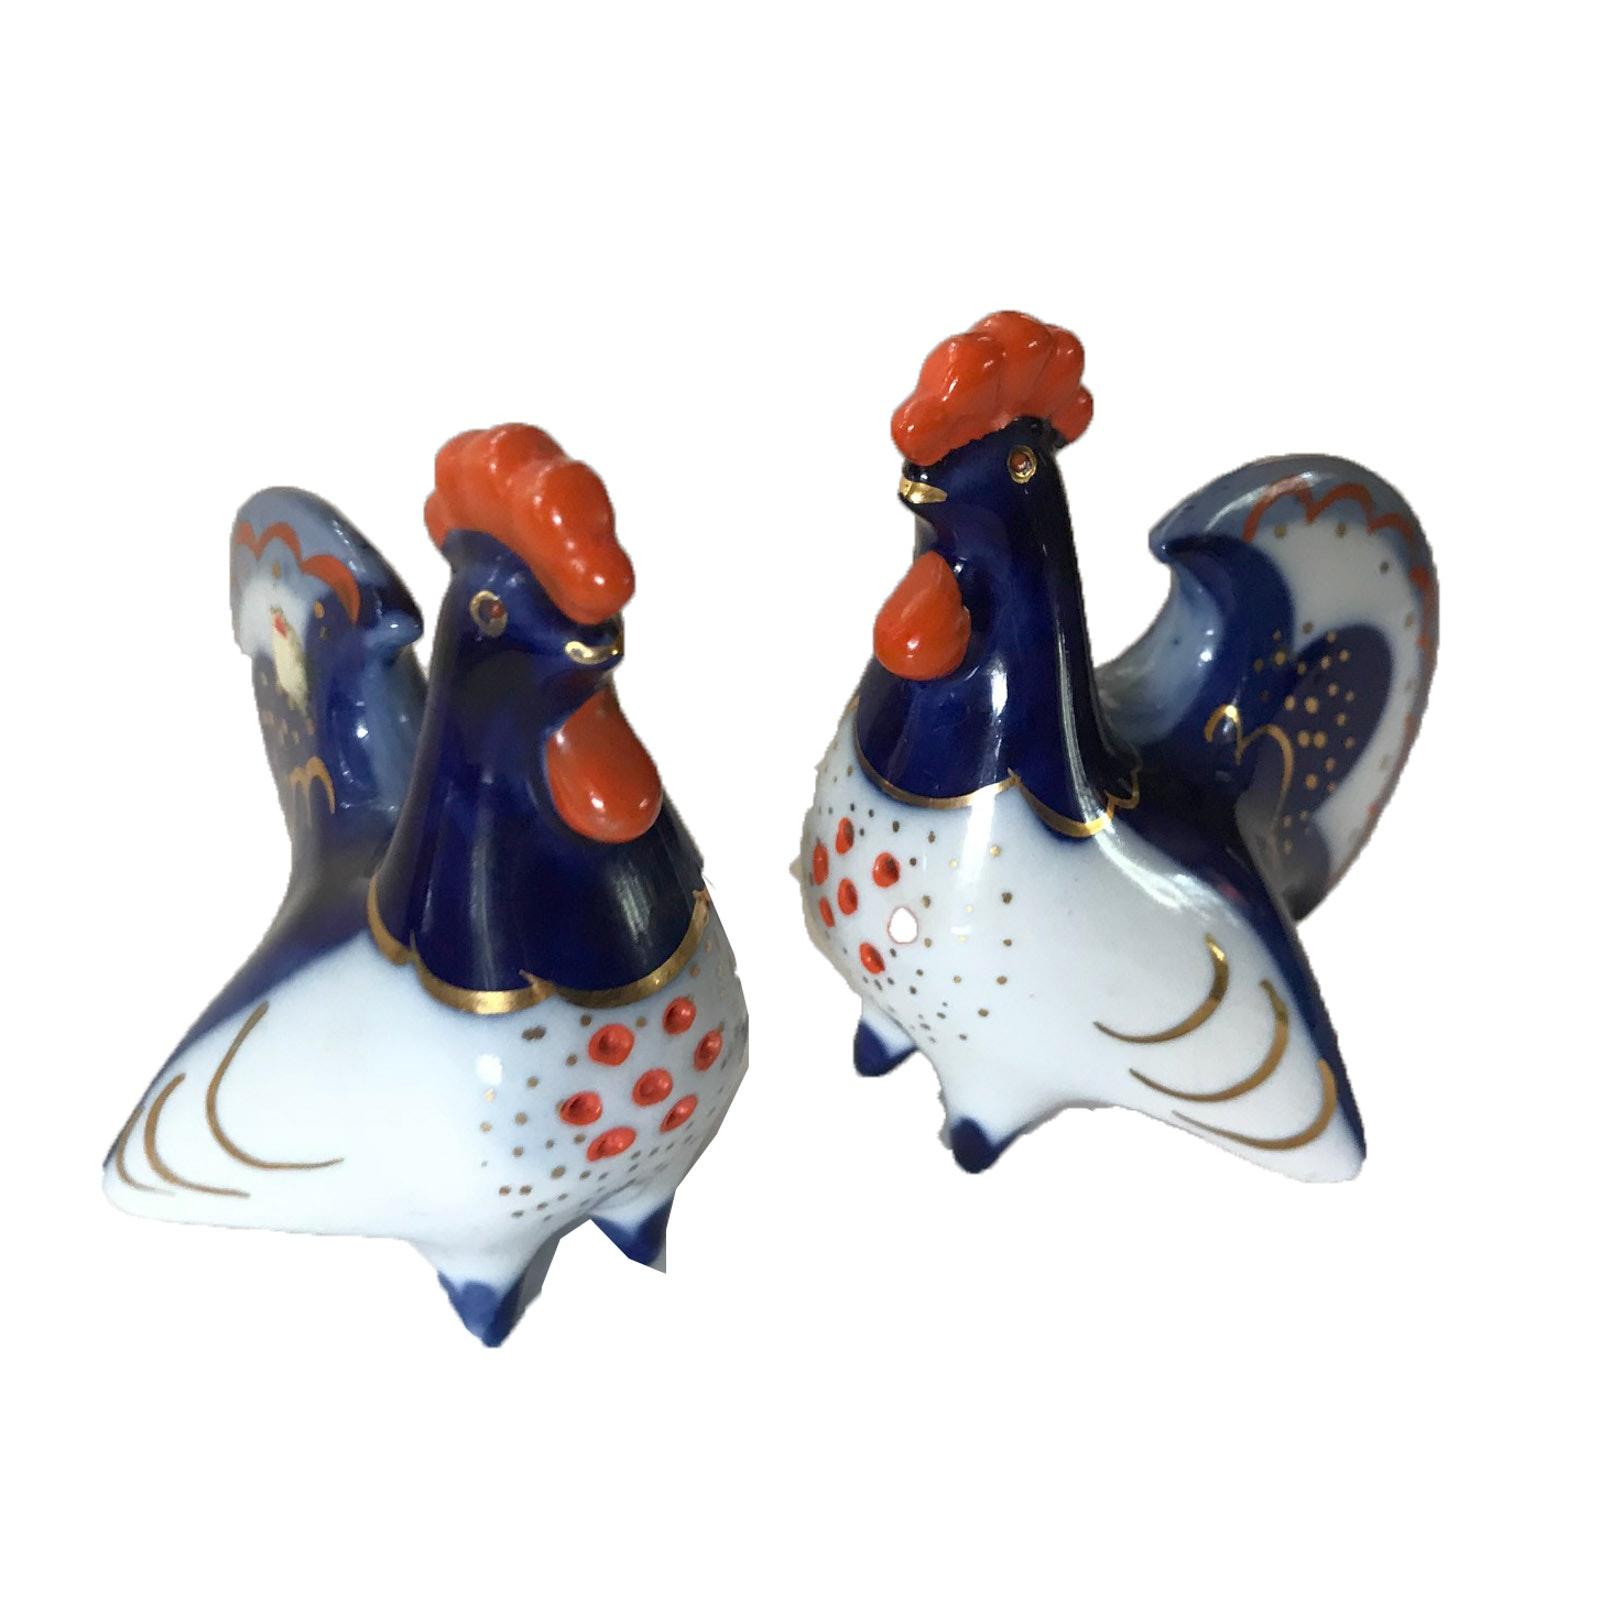 Vintage Russian Lomonosov Porcelain Rooster Salt Shakers